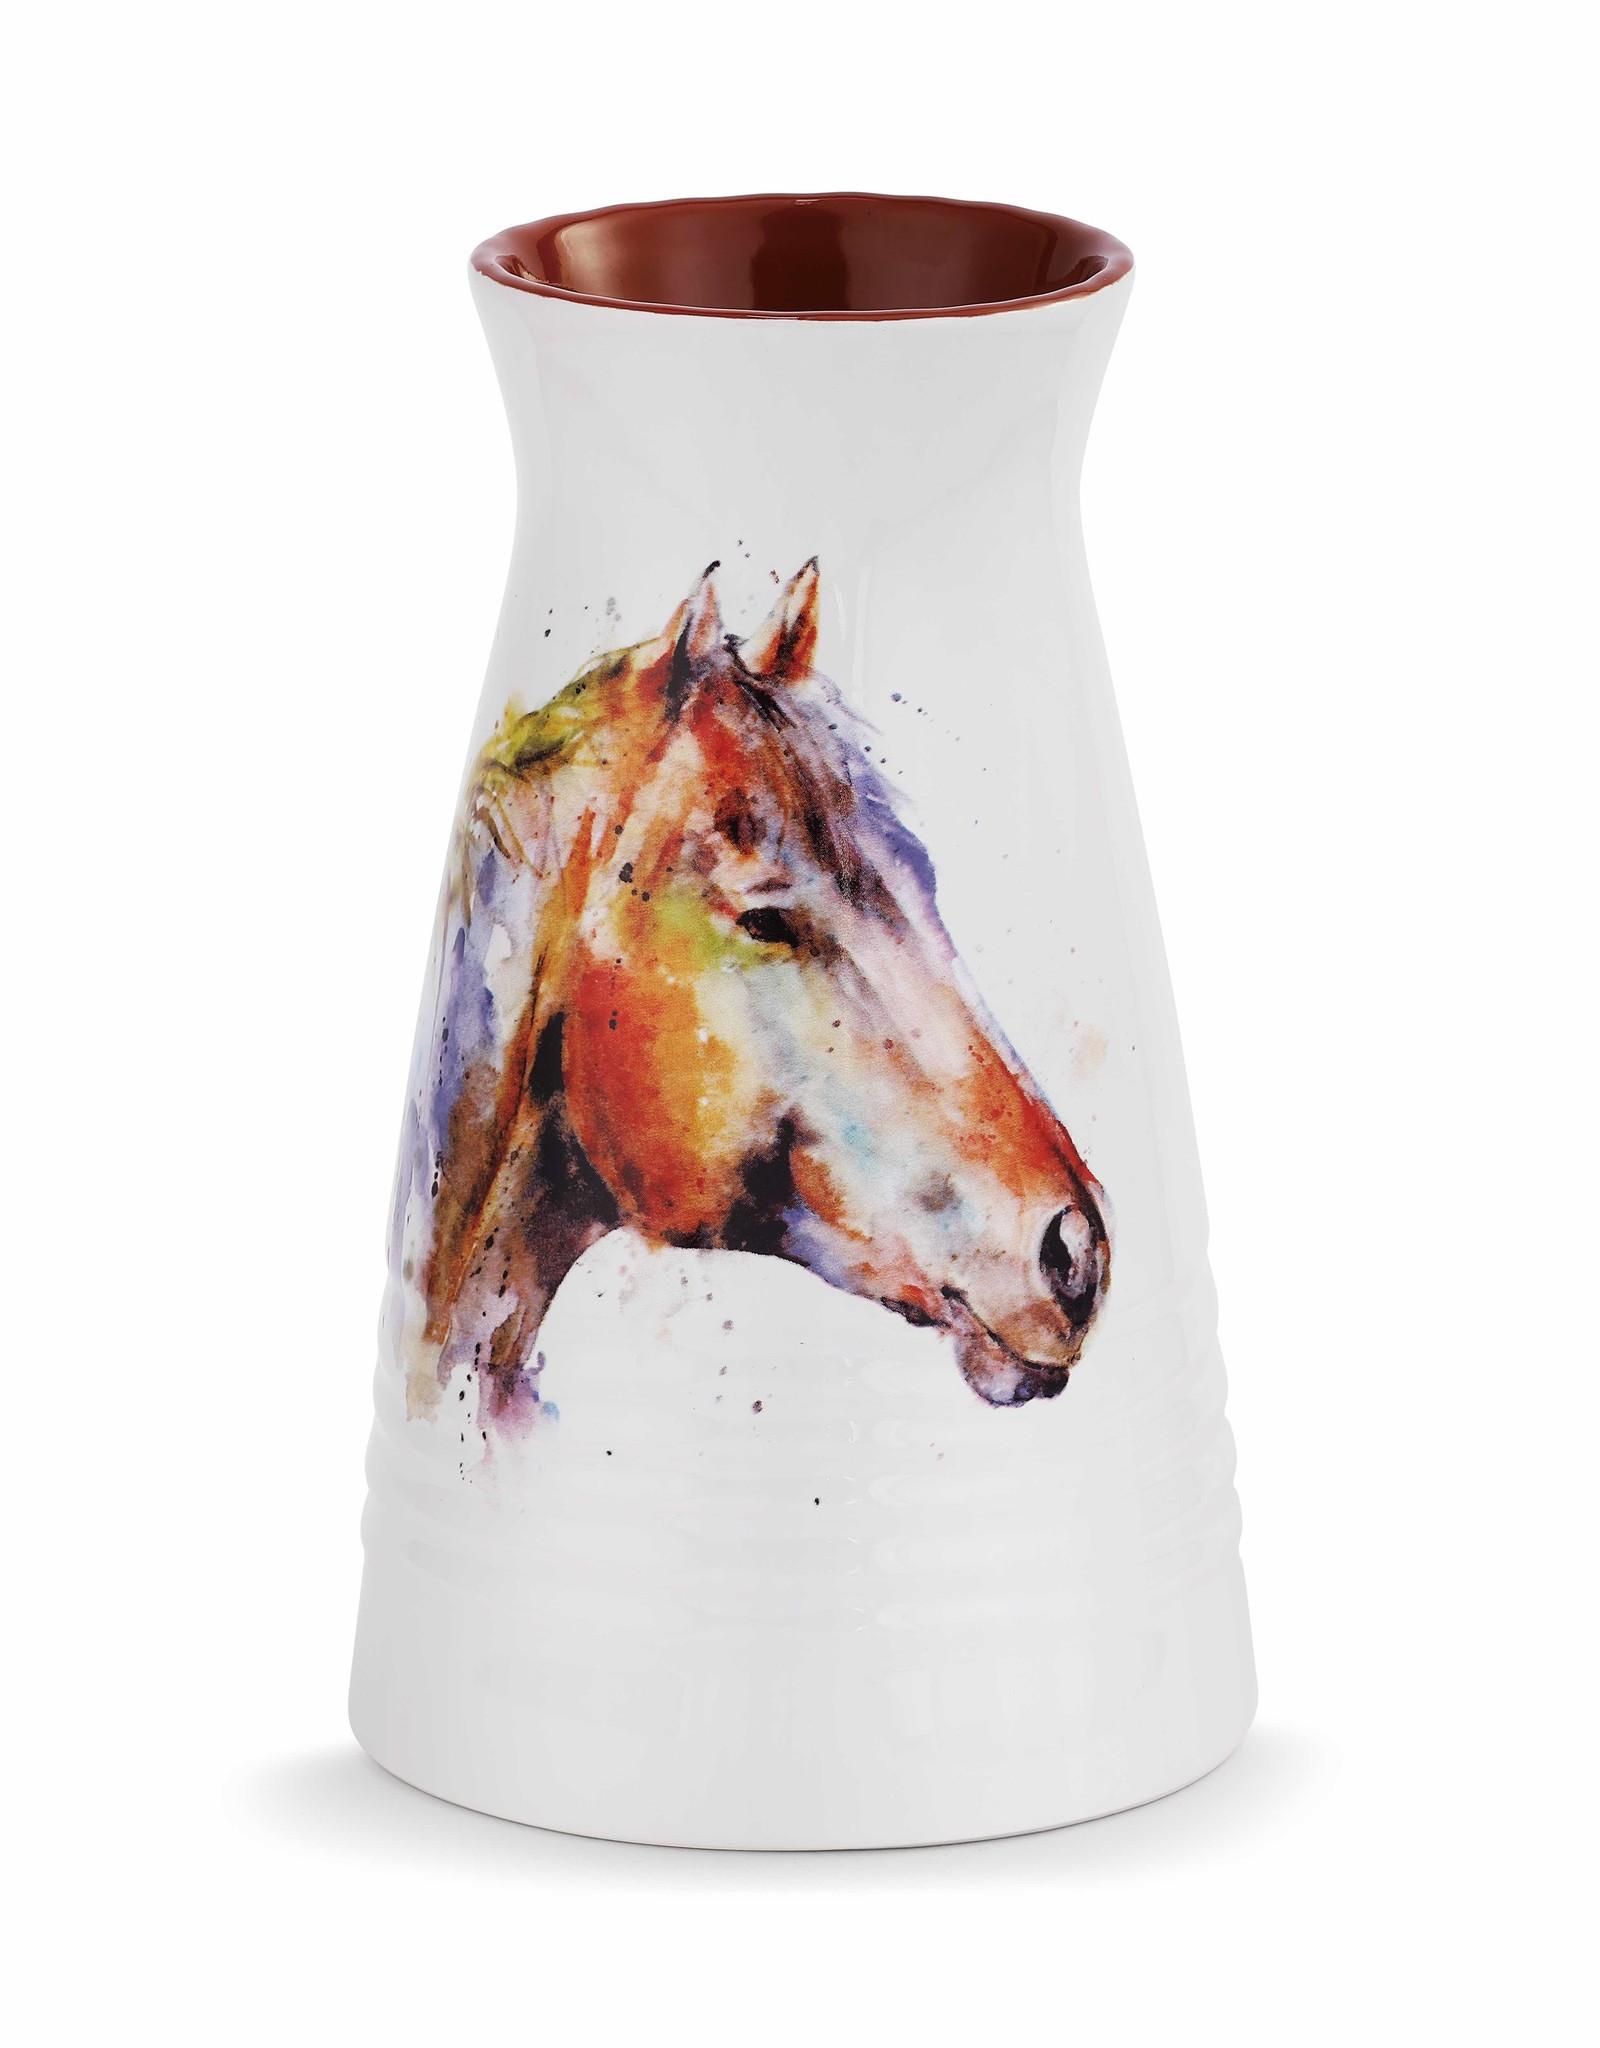 GOOD LOOKIN' HORSE VASE